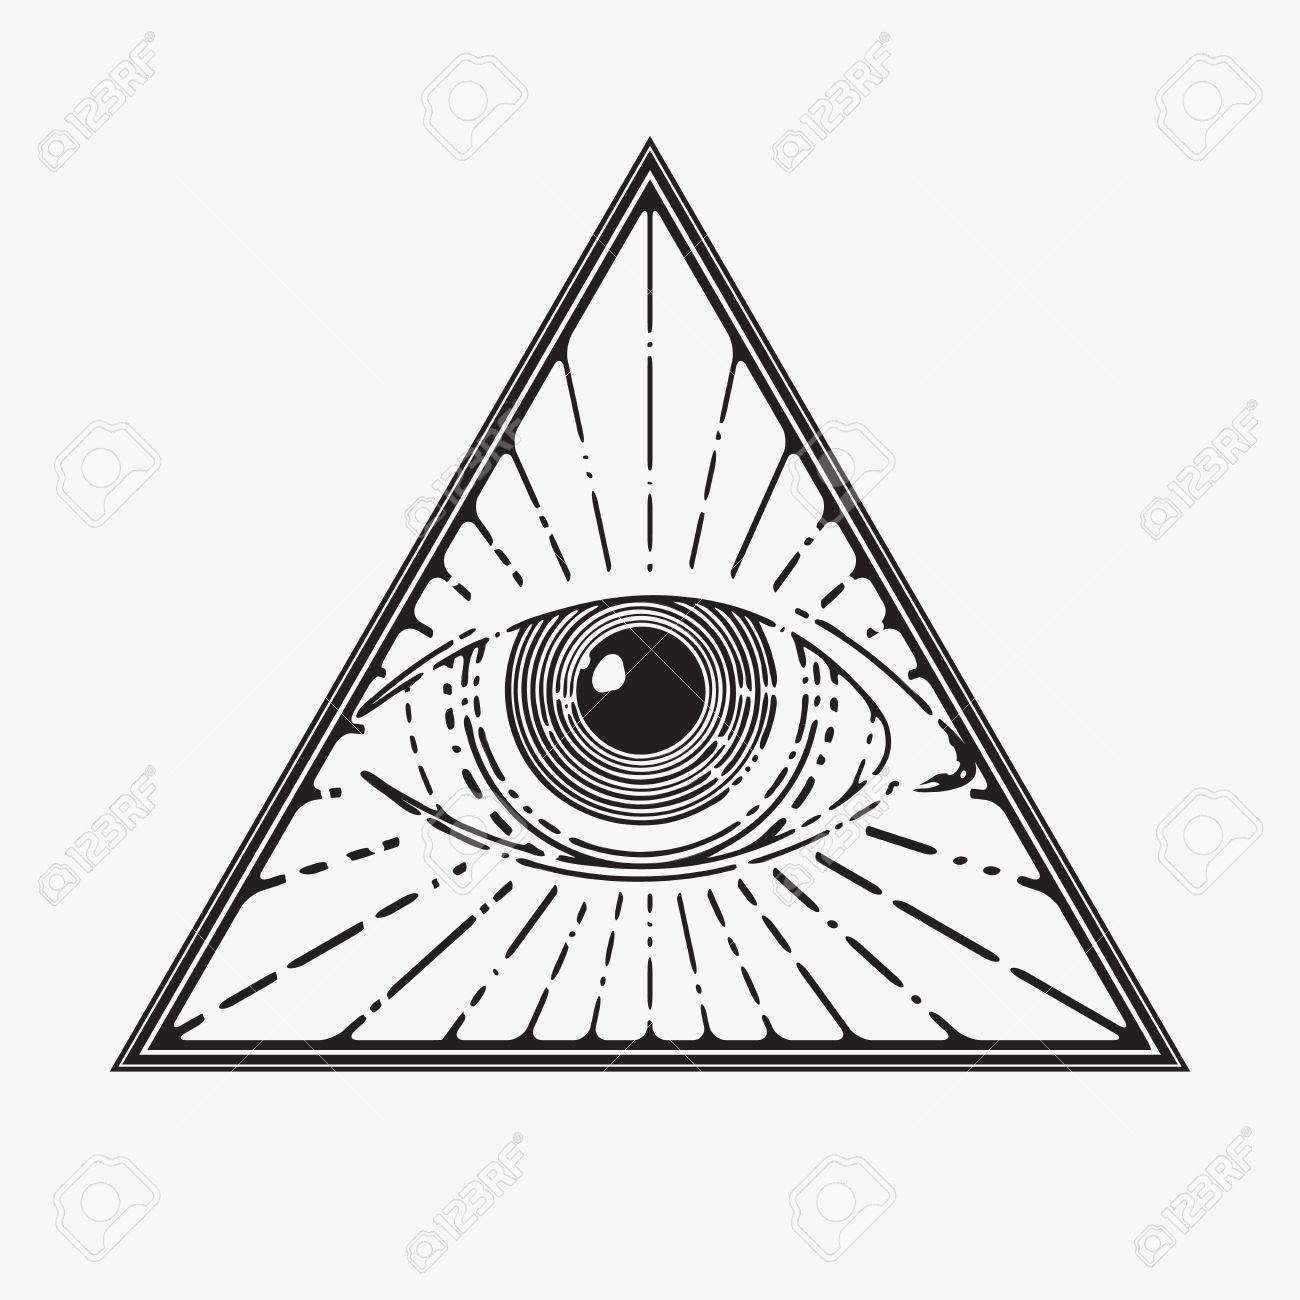 31280005 all seeing eye symbol vector illustration stock vector eye of providence all seeing eye symbol vector illustration illustration biocorpaavc